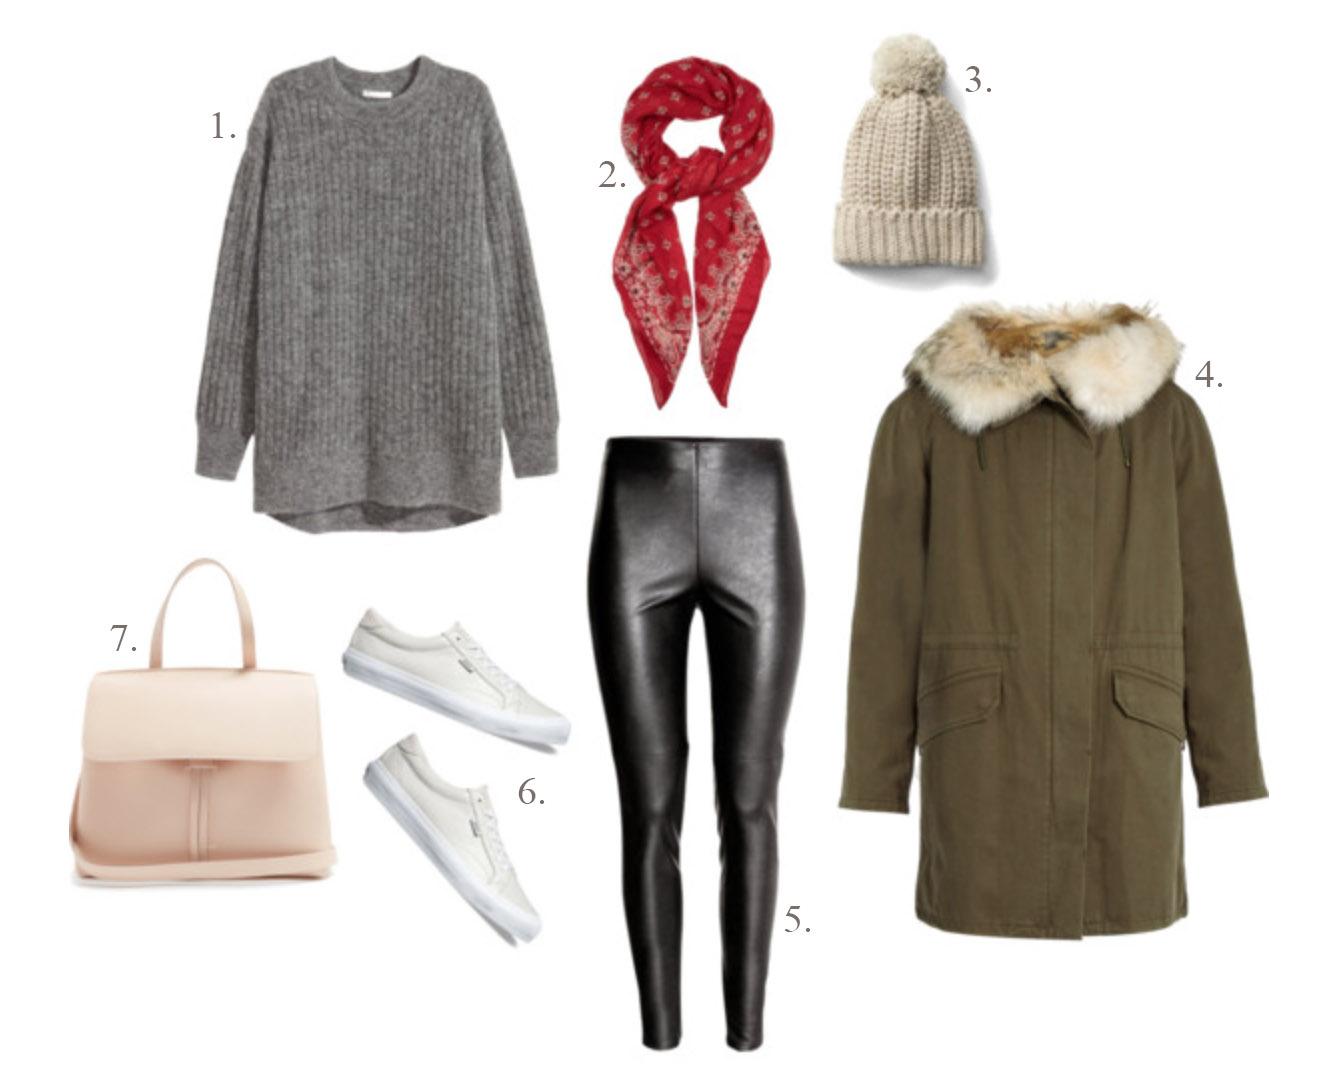 1.  H&M oversized mohair-blend sweater  | 2.  Saint Laurent bandana-print scarf  | 3.  Gap ribbed beanie  [ sold out  -  similar here ] | 4.  Yves Soloman fur-lined parka  | 5.  H&M faux leather leggings  | 6.  Vans leather court sneaker  | 7.  Mansur Gabriel Lady bag